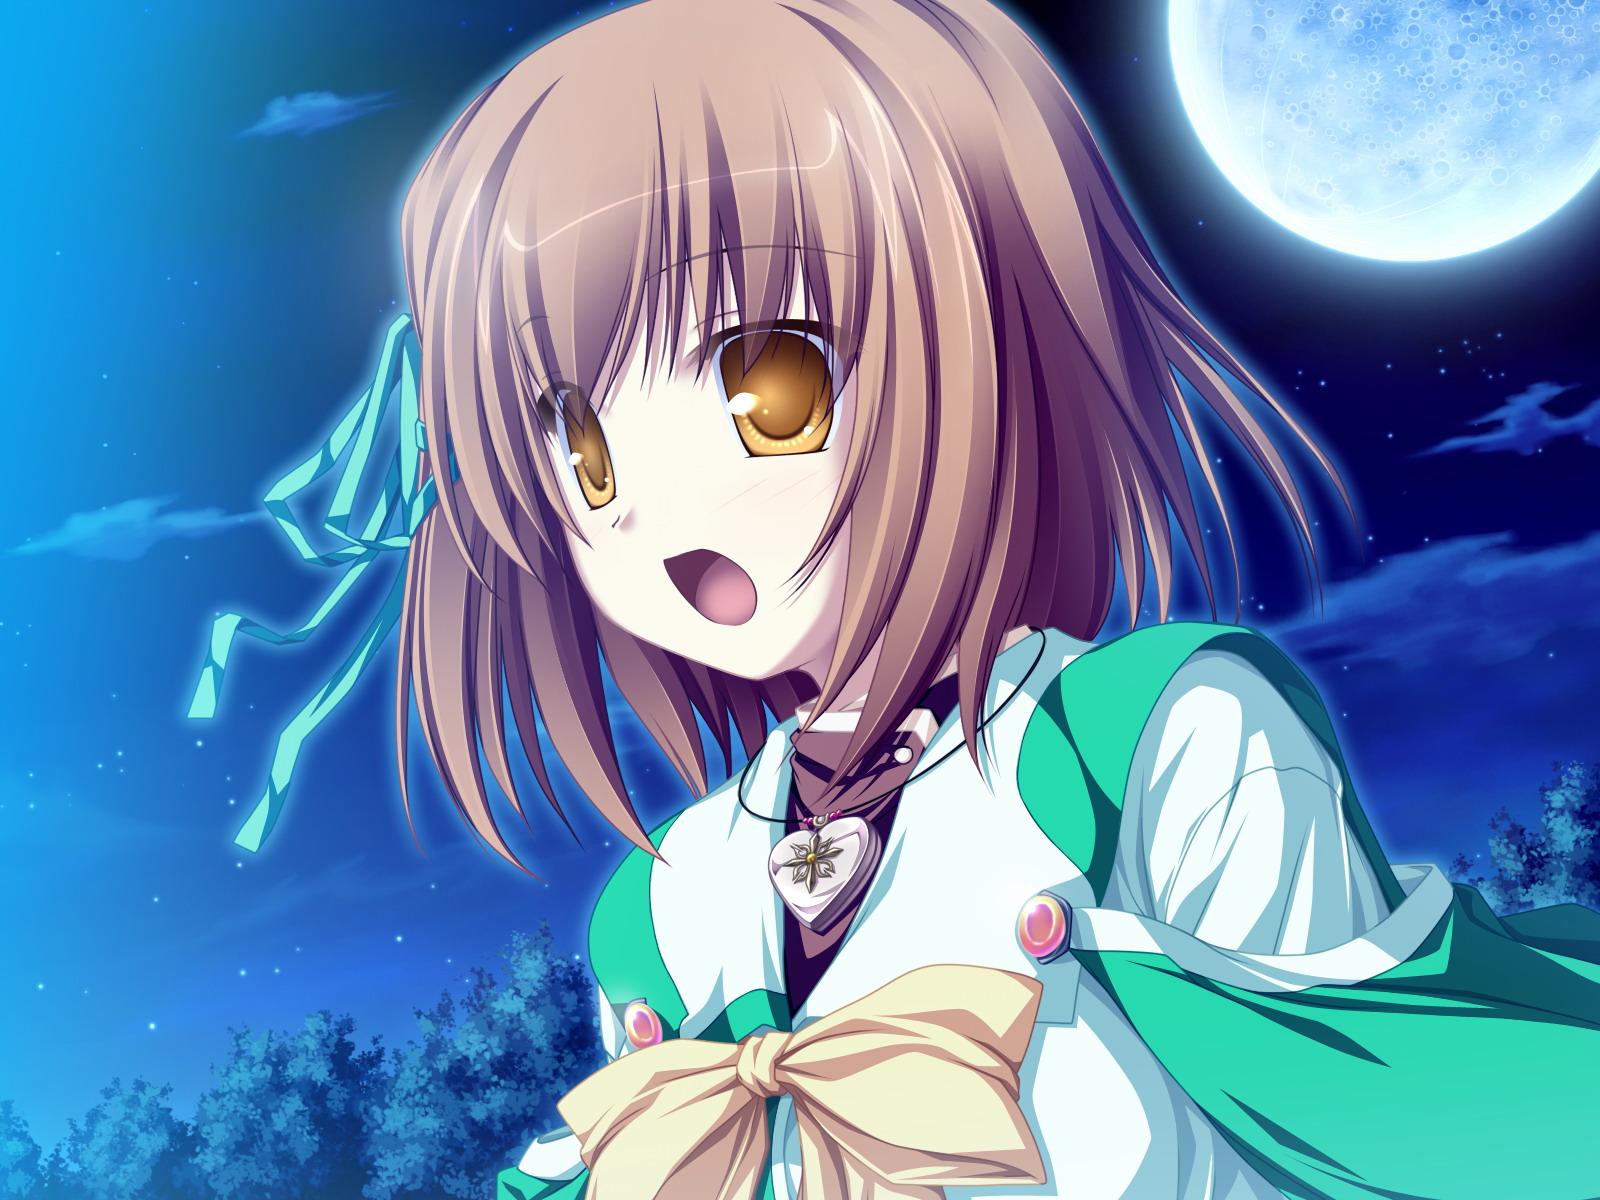 game_cg koyuki_amagase magus_tale school_uniform short_hair tenmaso whirlpool yellow_eyes